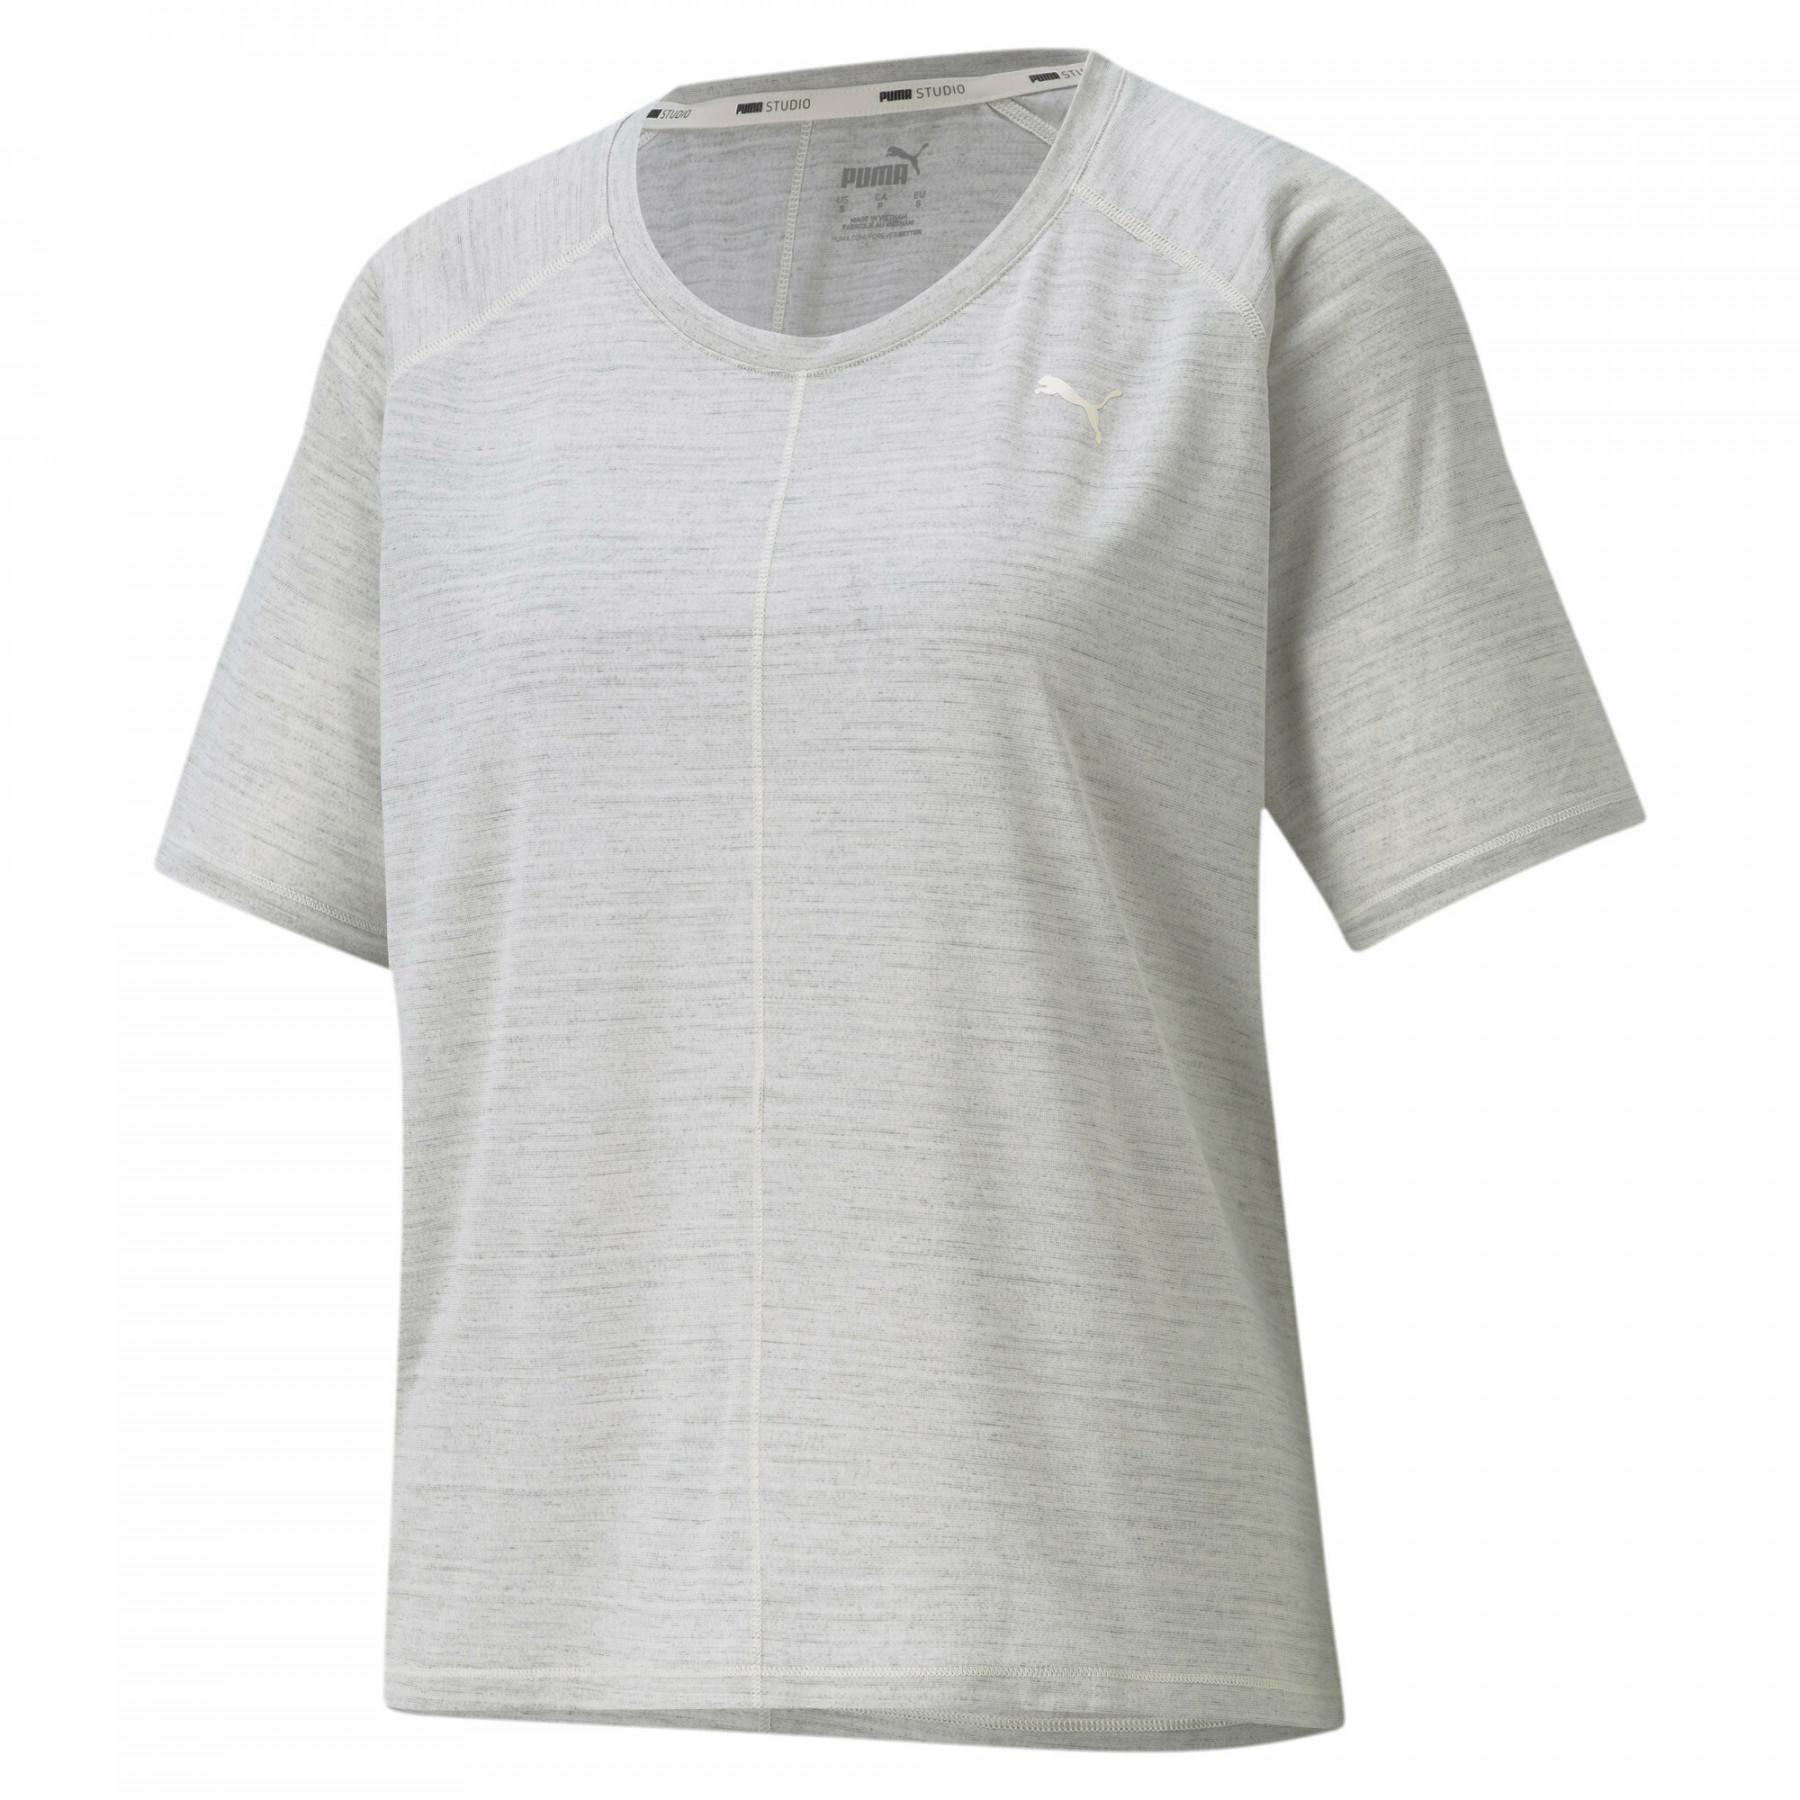 Women's T-shirt Puma Studio Graphene Relaxed